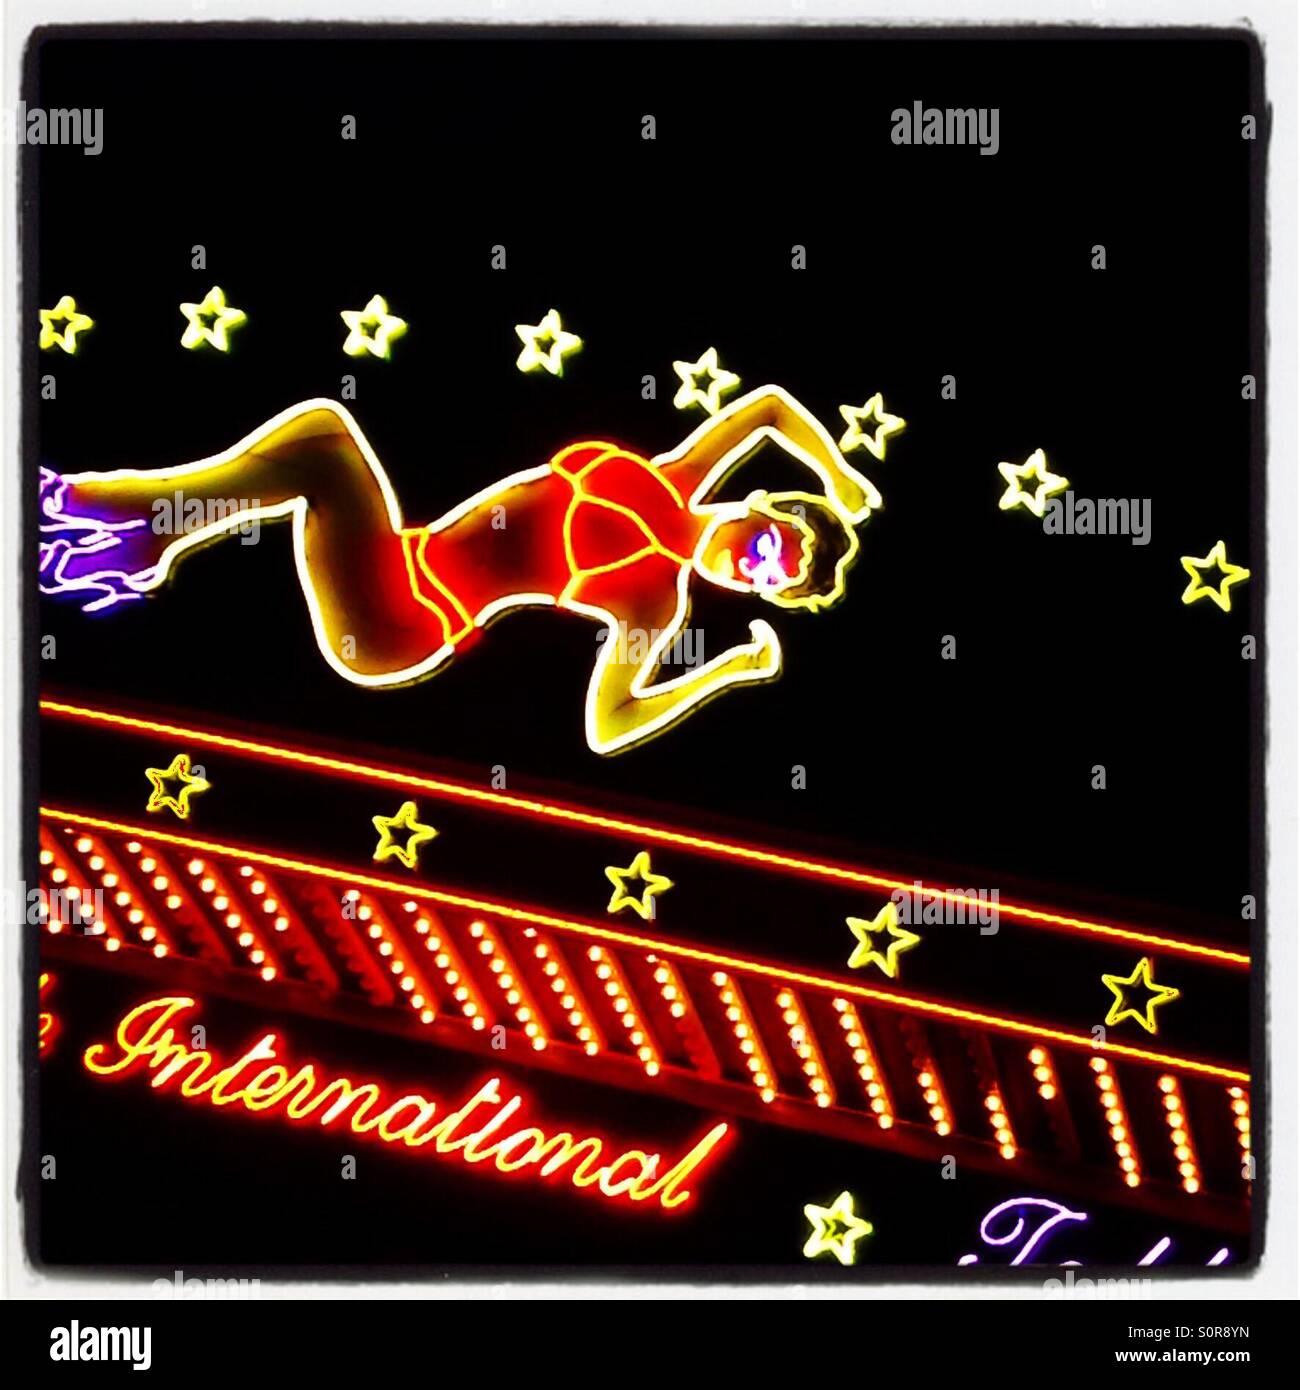 Paris strip club neon lighting stock photo royalty free image paris strip club neon lighting aloadofball Image collections